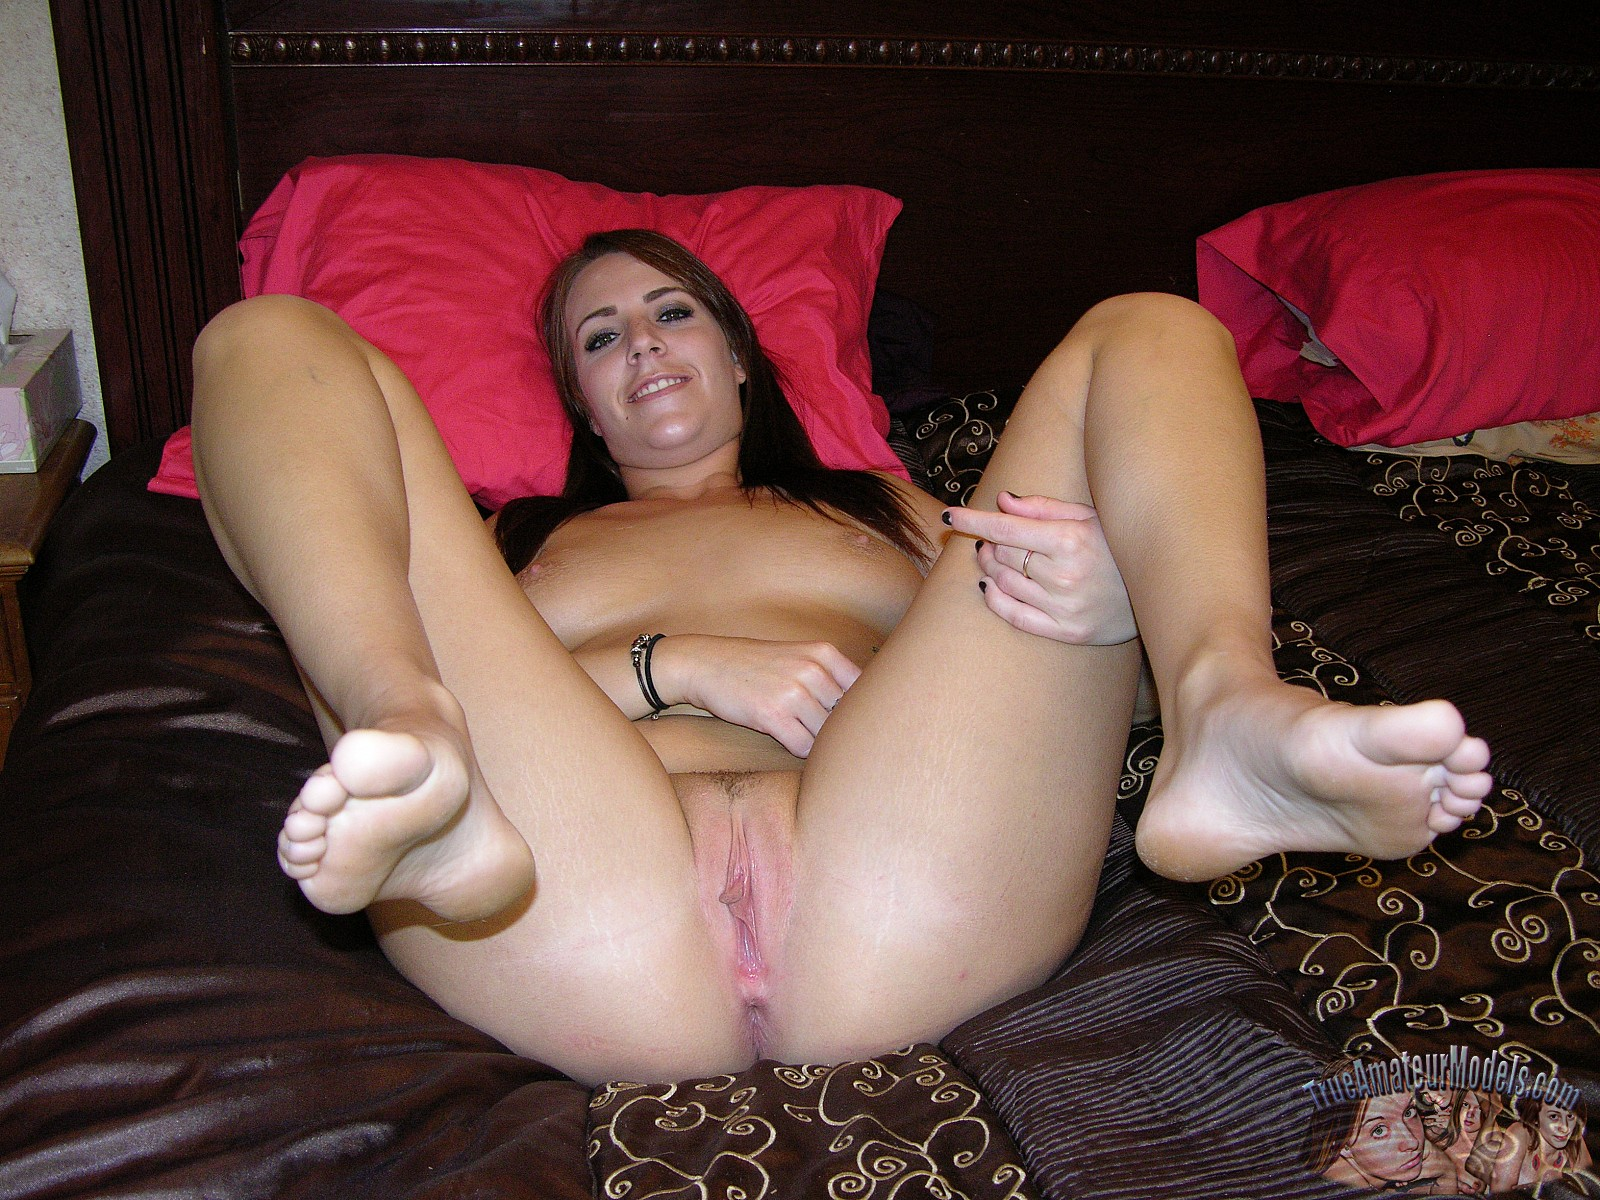 Sienna west hot tits